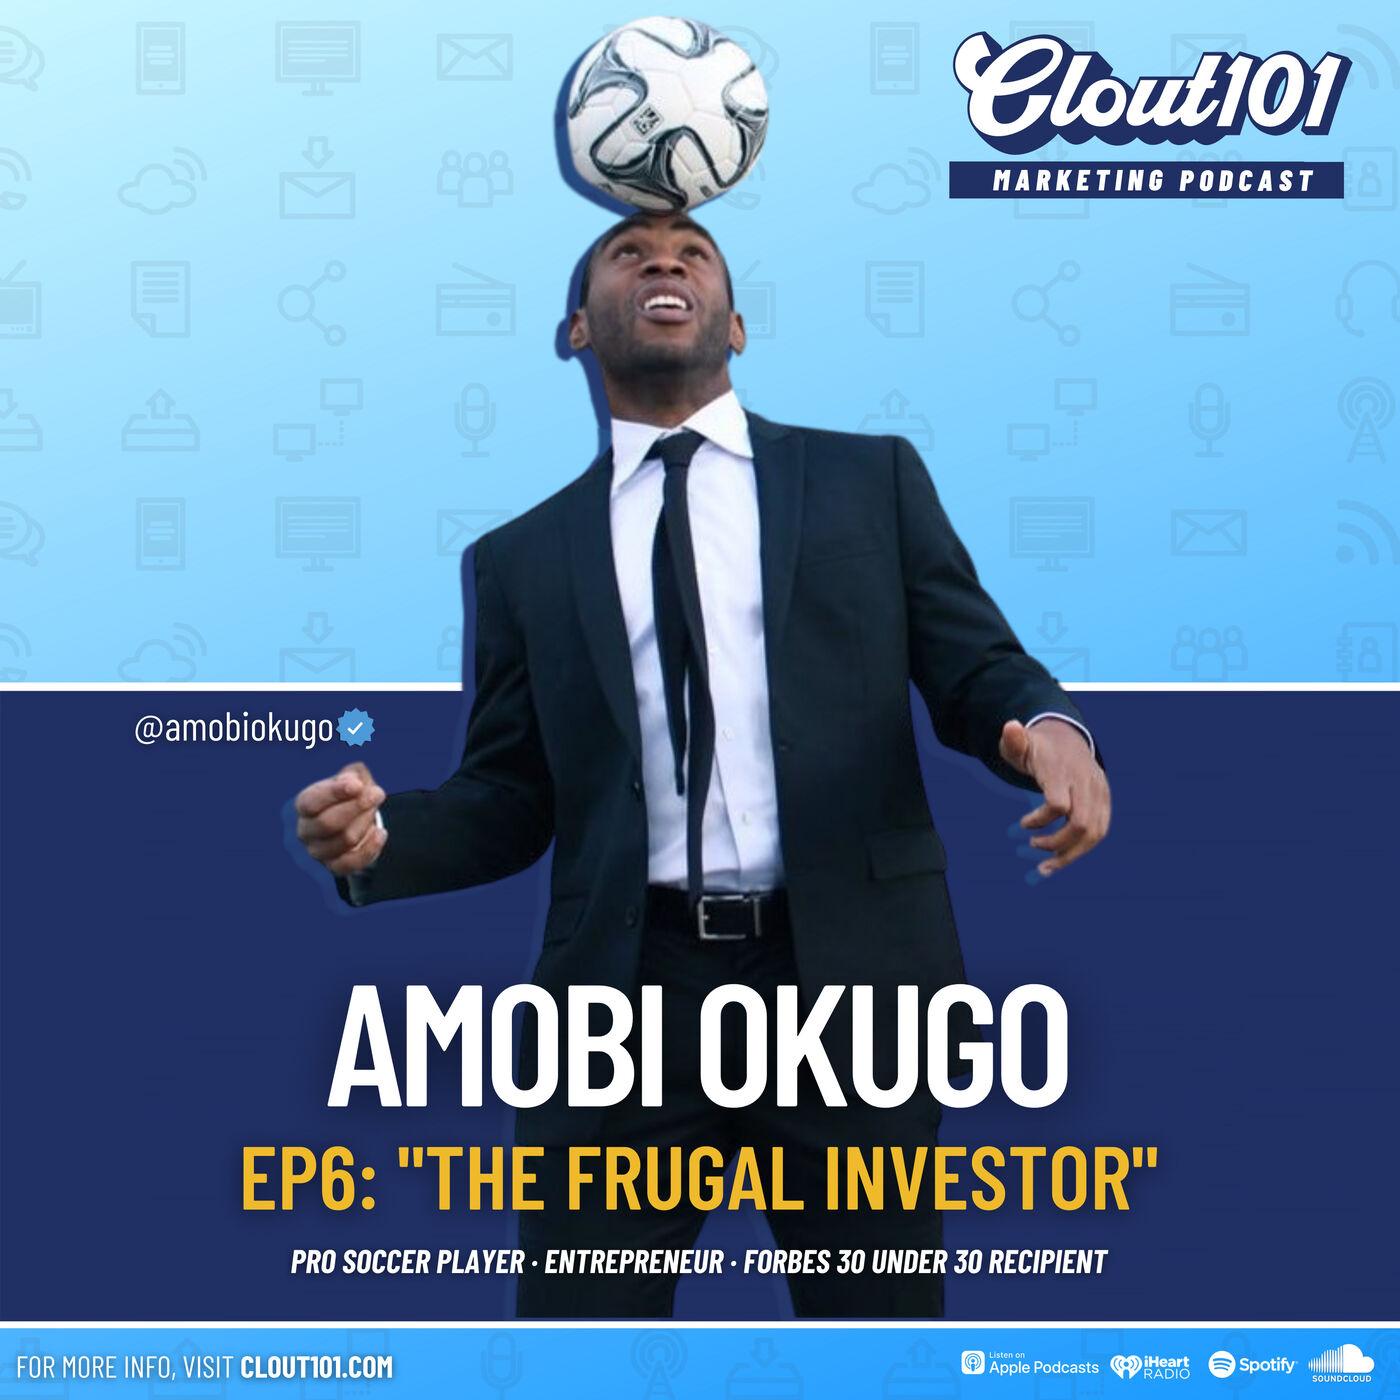 6: Amobi Okugo on Athlete Branding, Financial Education, and A Frugal Athlete